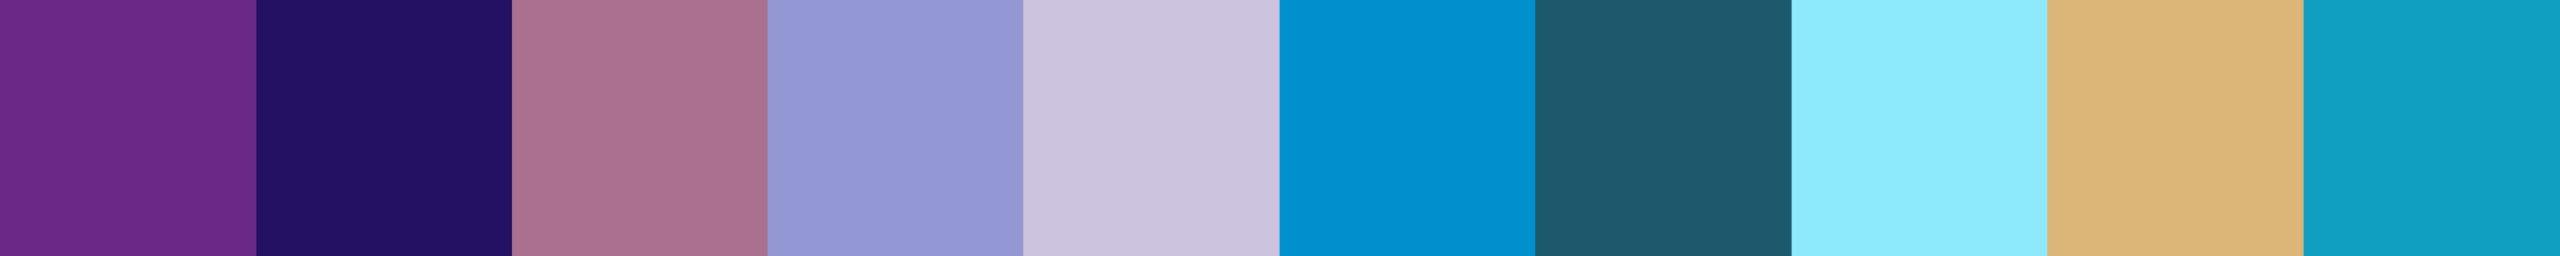 522 Batya Color Palette